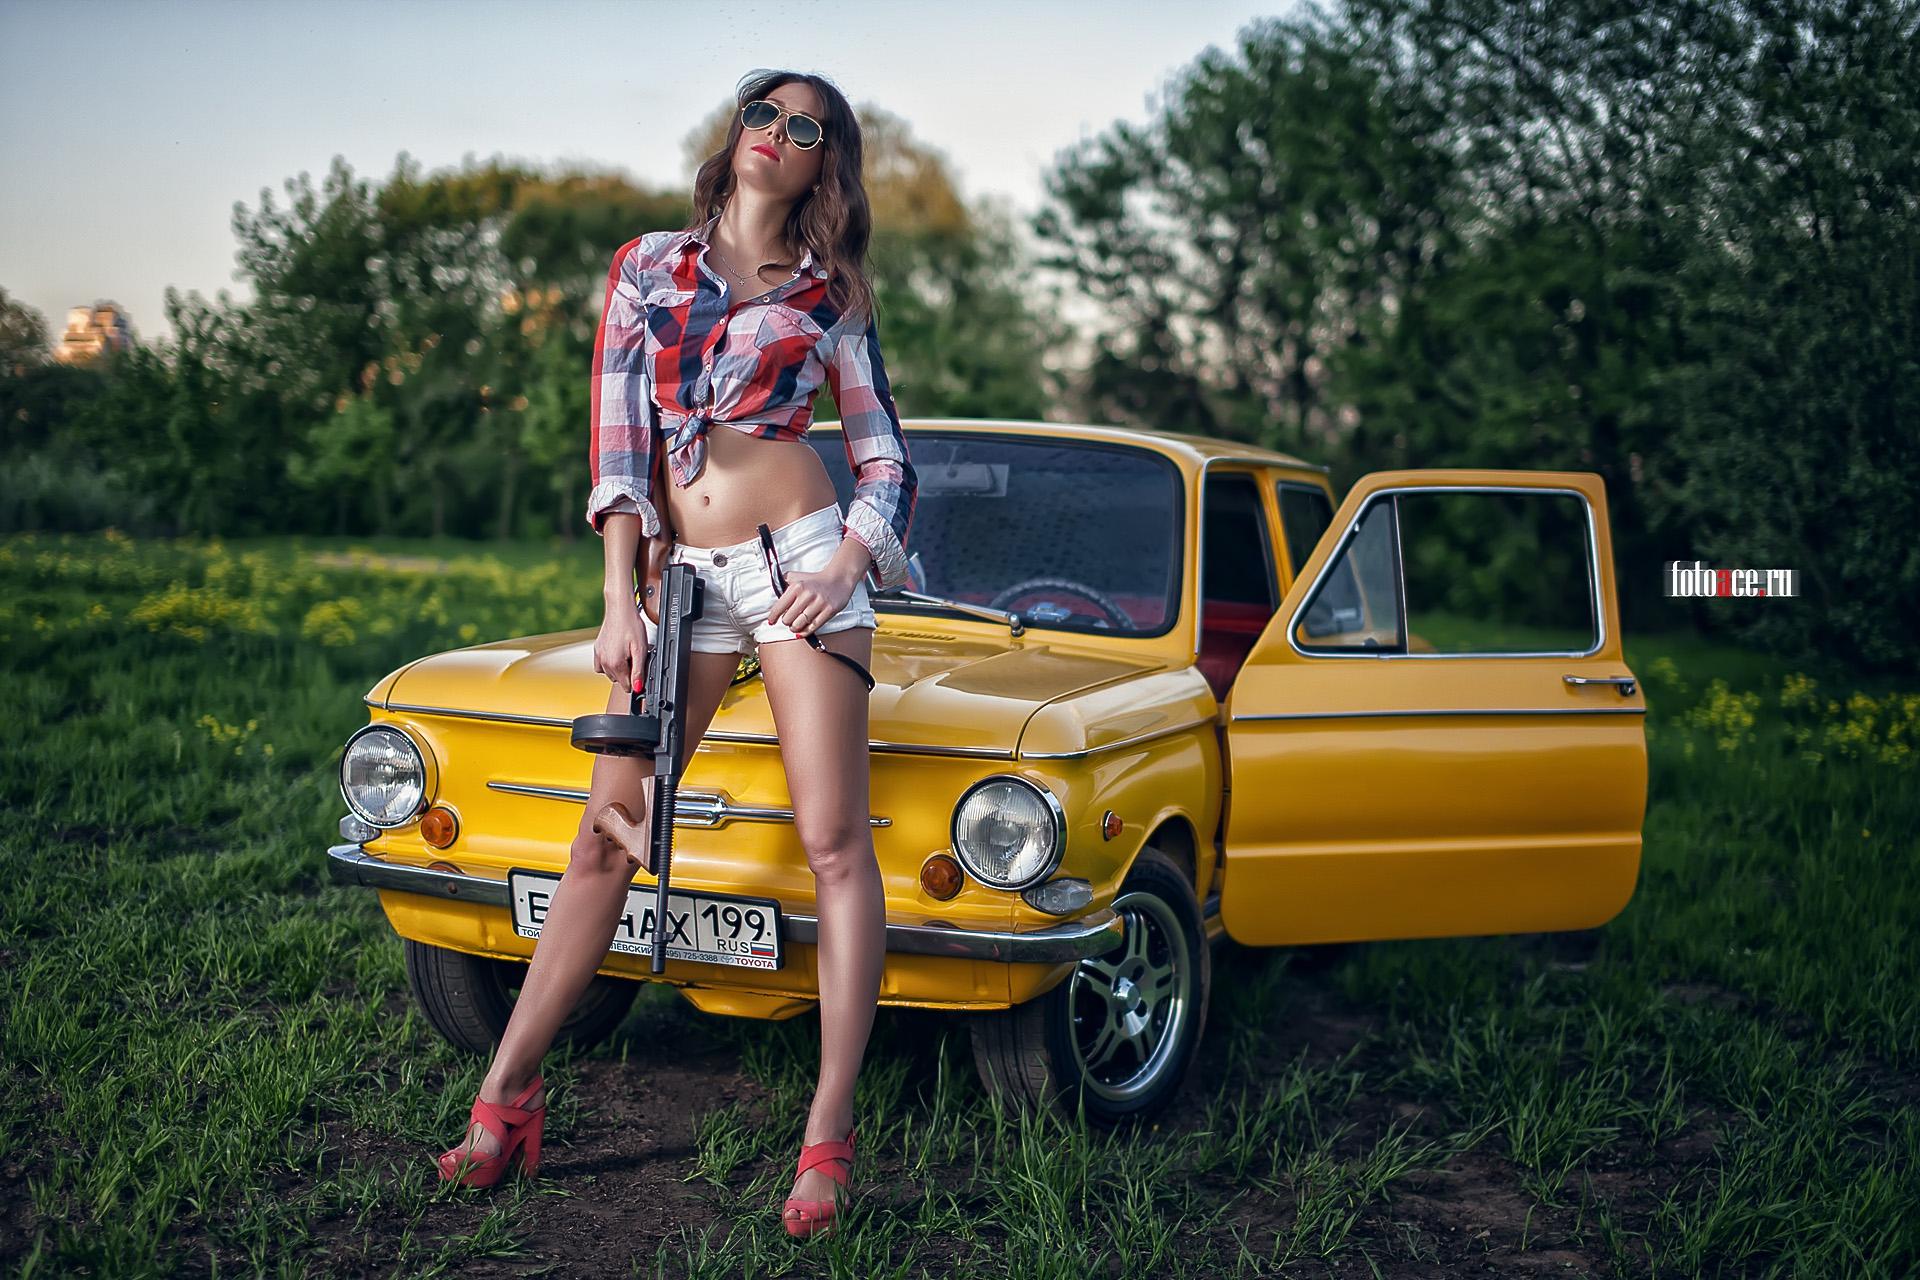 Фри картинки, картинки девушки и авто прикольные